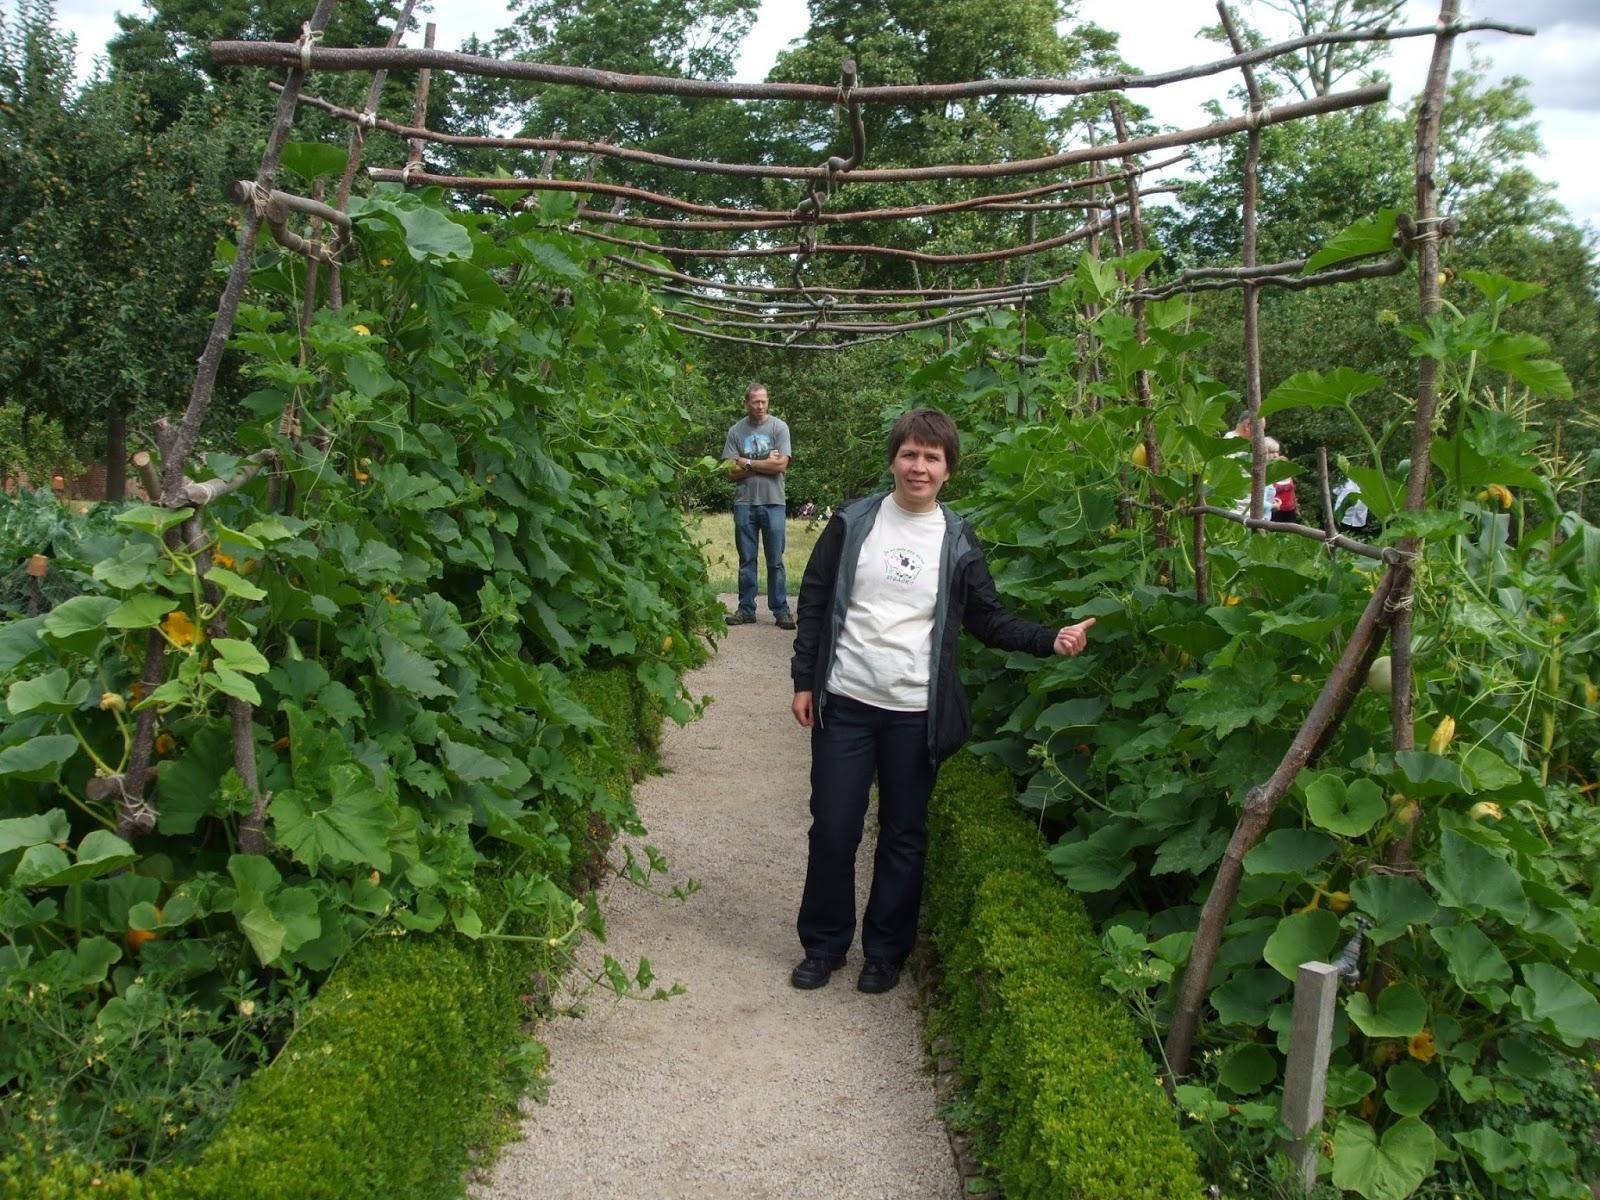 The Naked Gardener by L. B. Gschwandtner (2010, Trade